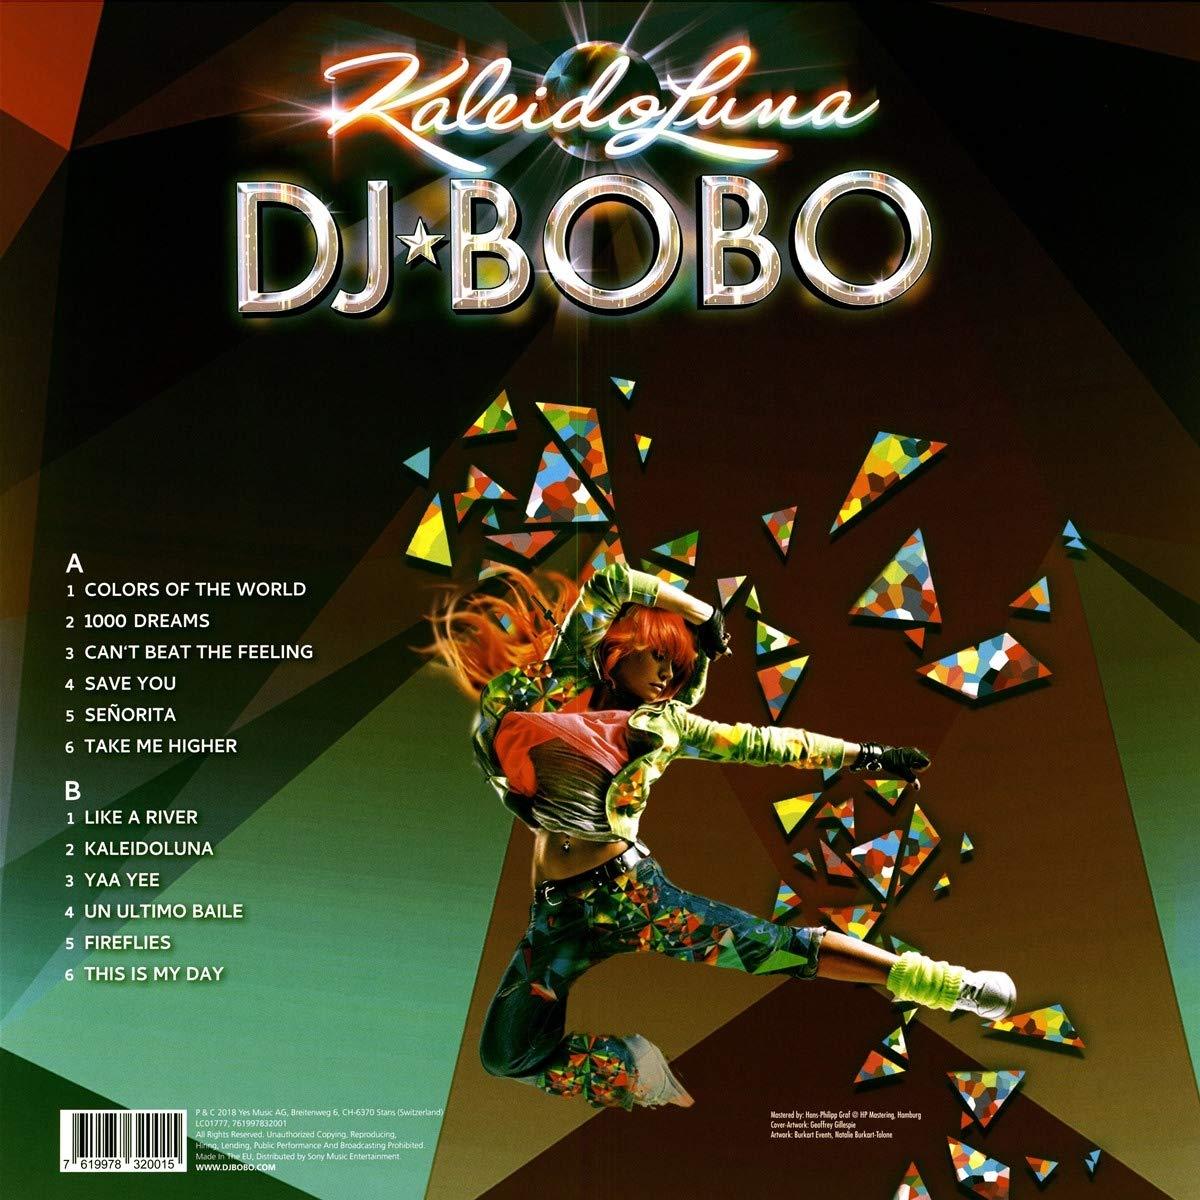 DJ Bobo - Kaleidoluna [Vinyl LP] [VINYL] - Amazon.com Music